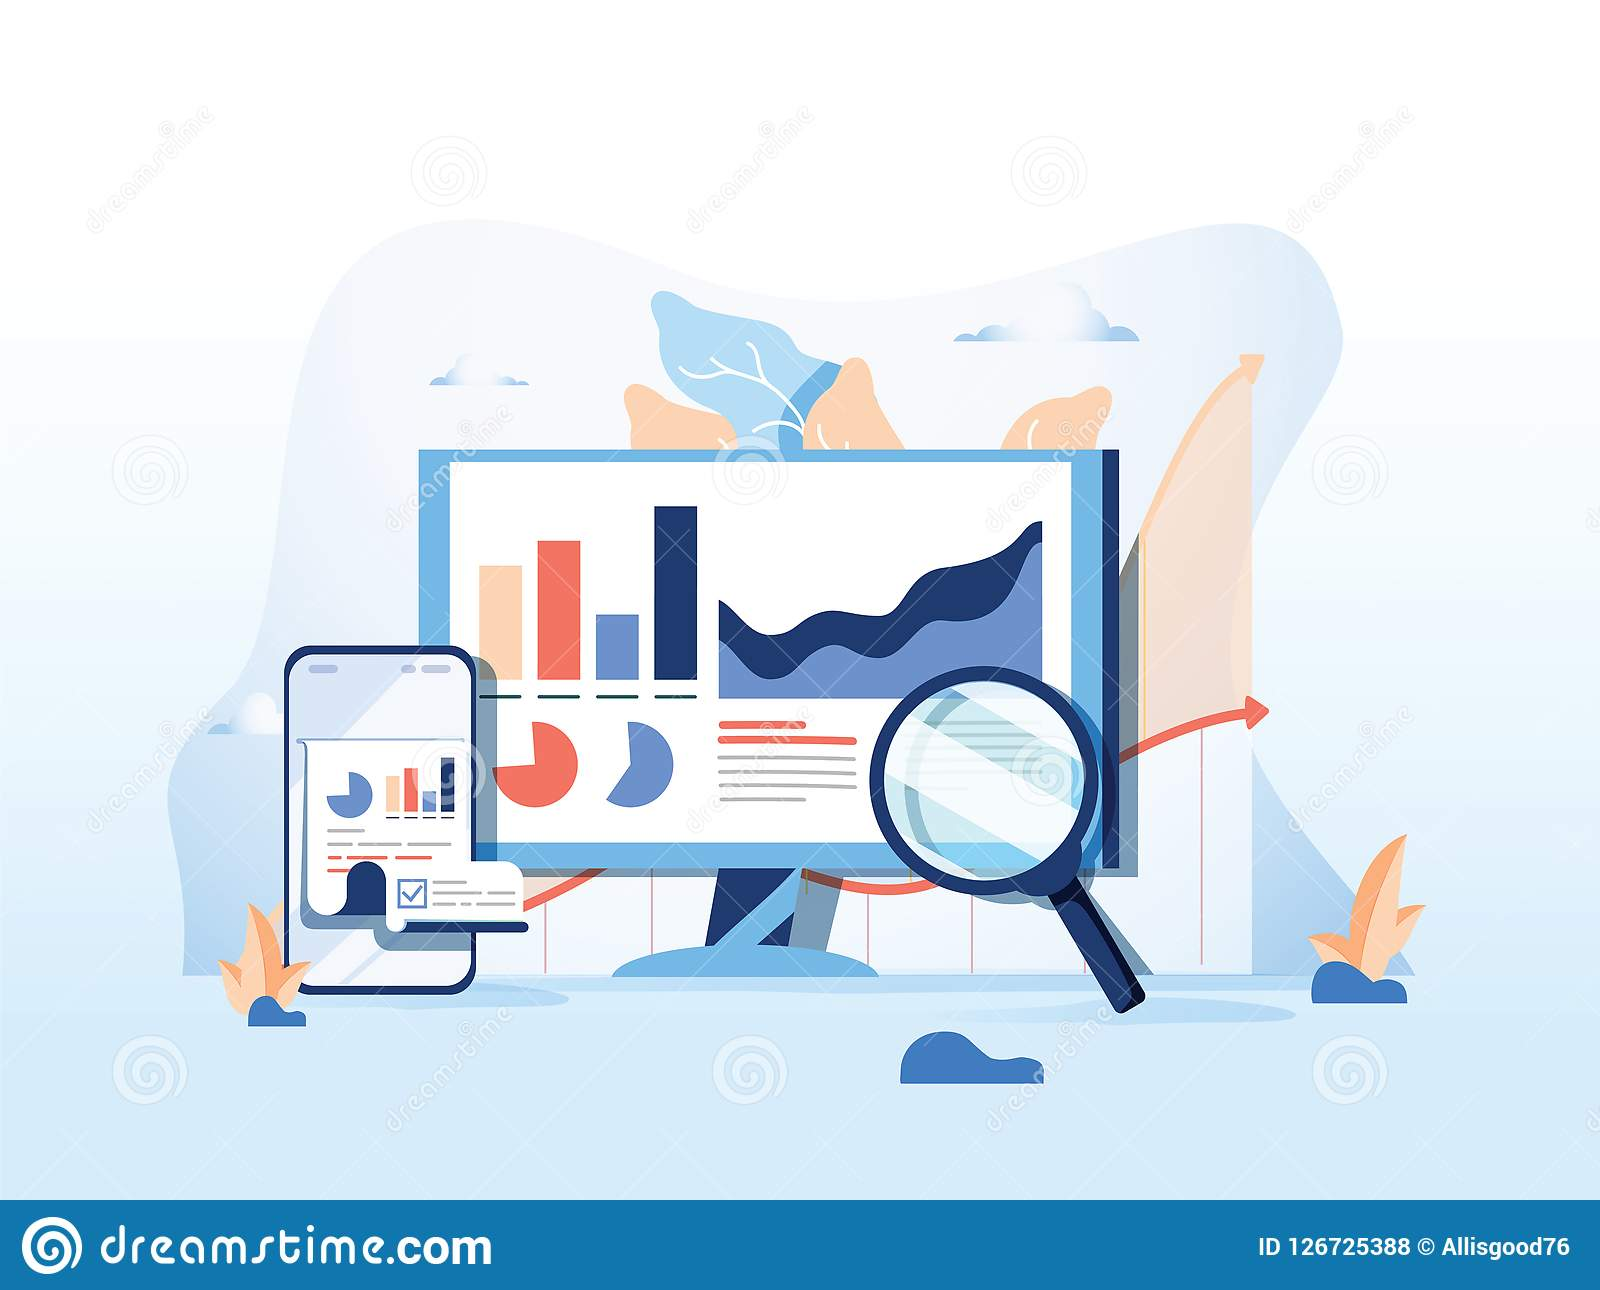 SEO reporting, data monitoring, web traffic analytics, Big data flat vector illustration on blue background.